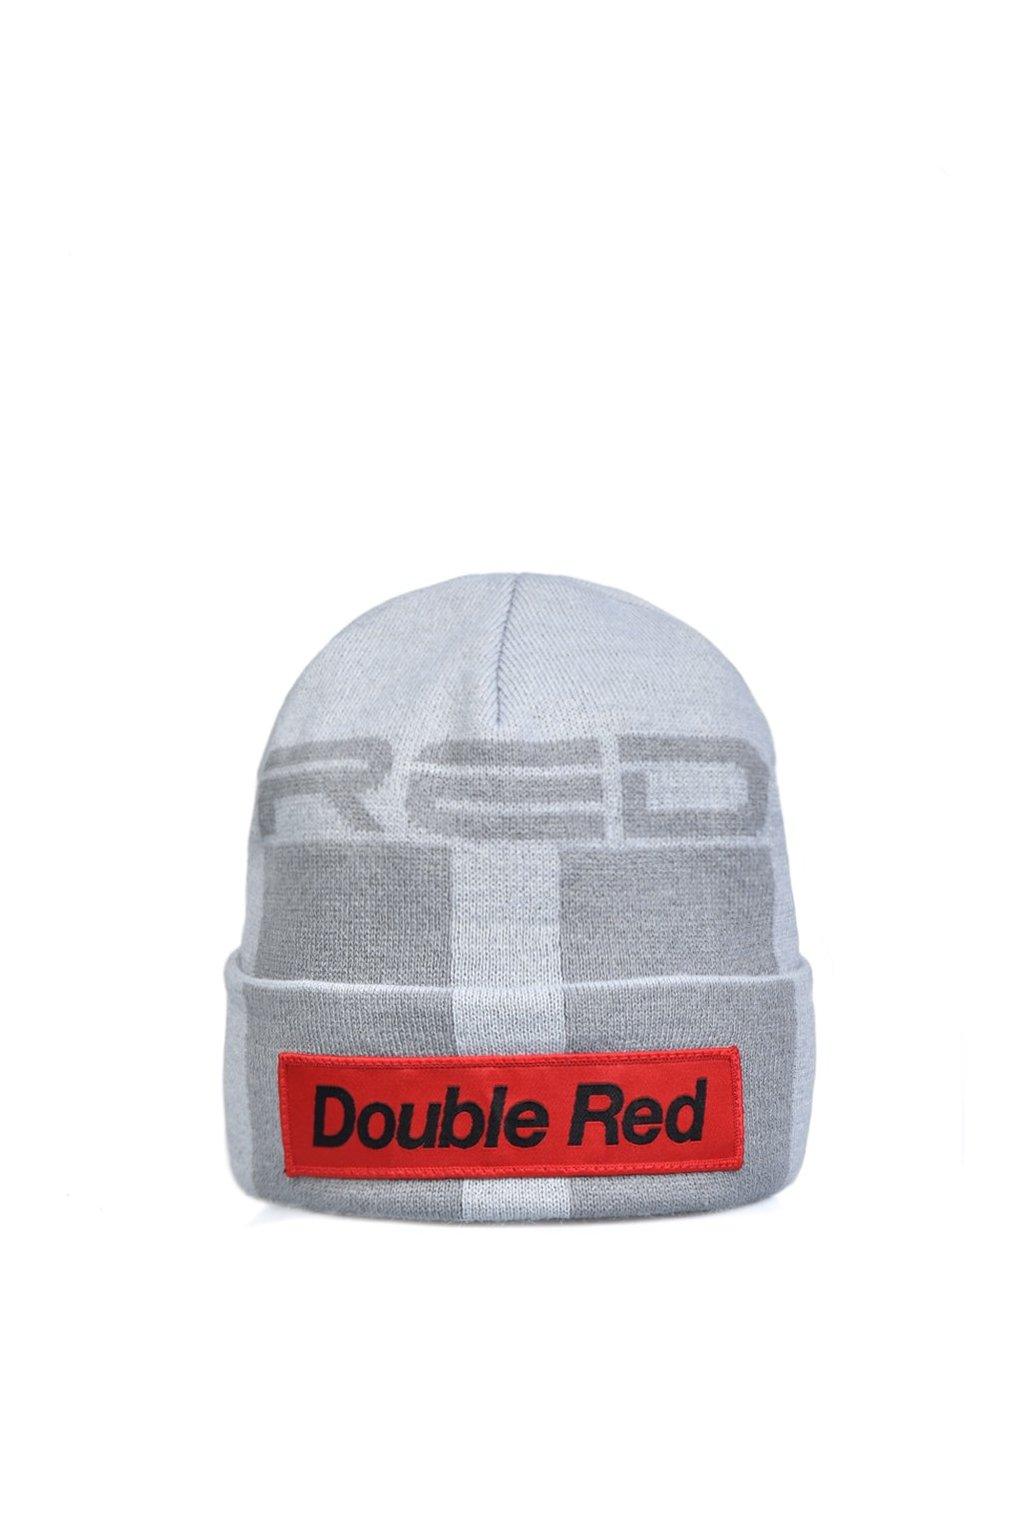 DOUBLE RED kulich STREET HERO Trademark Grey obr1